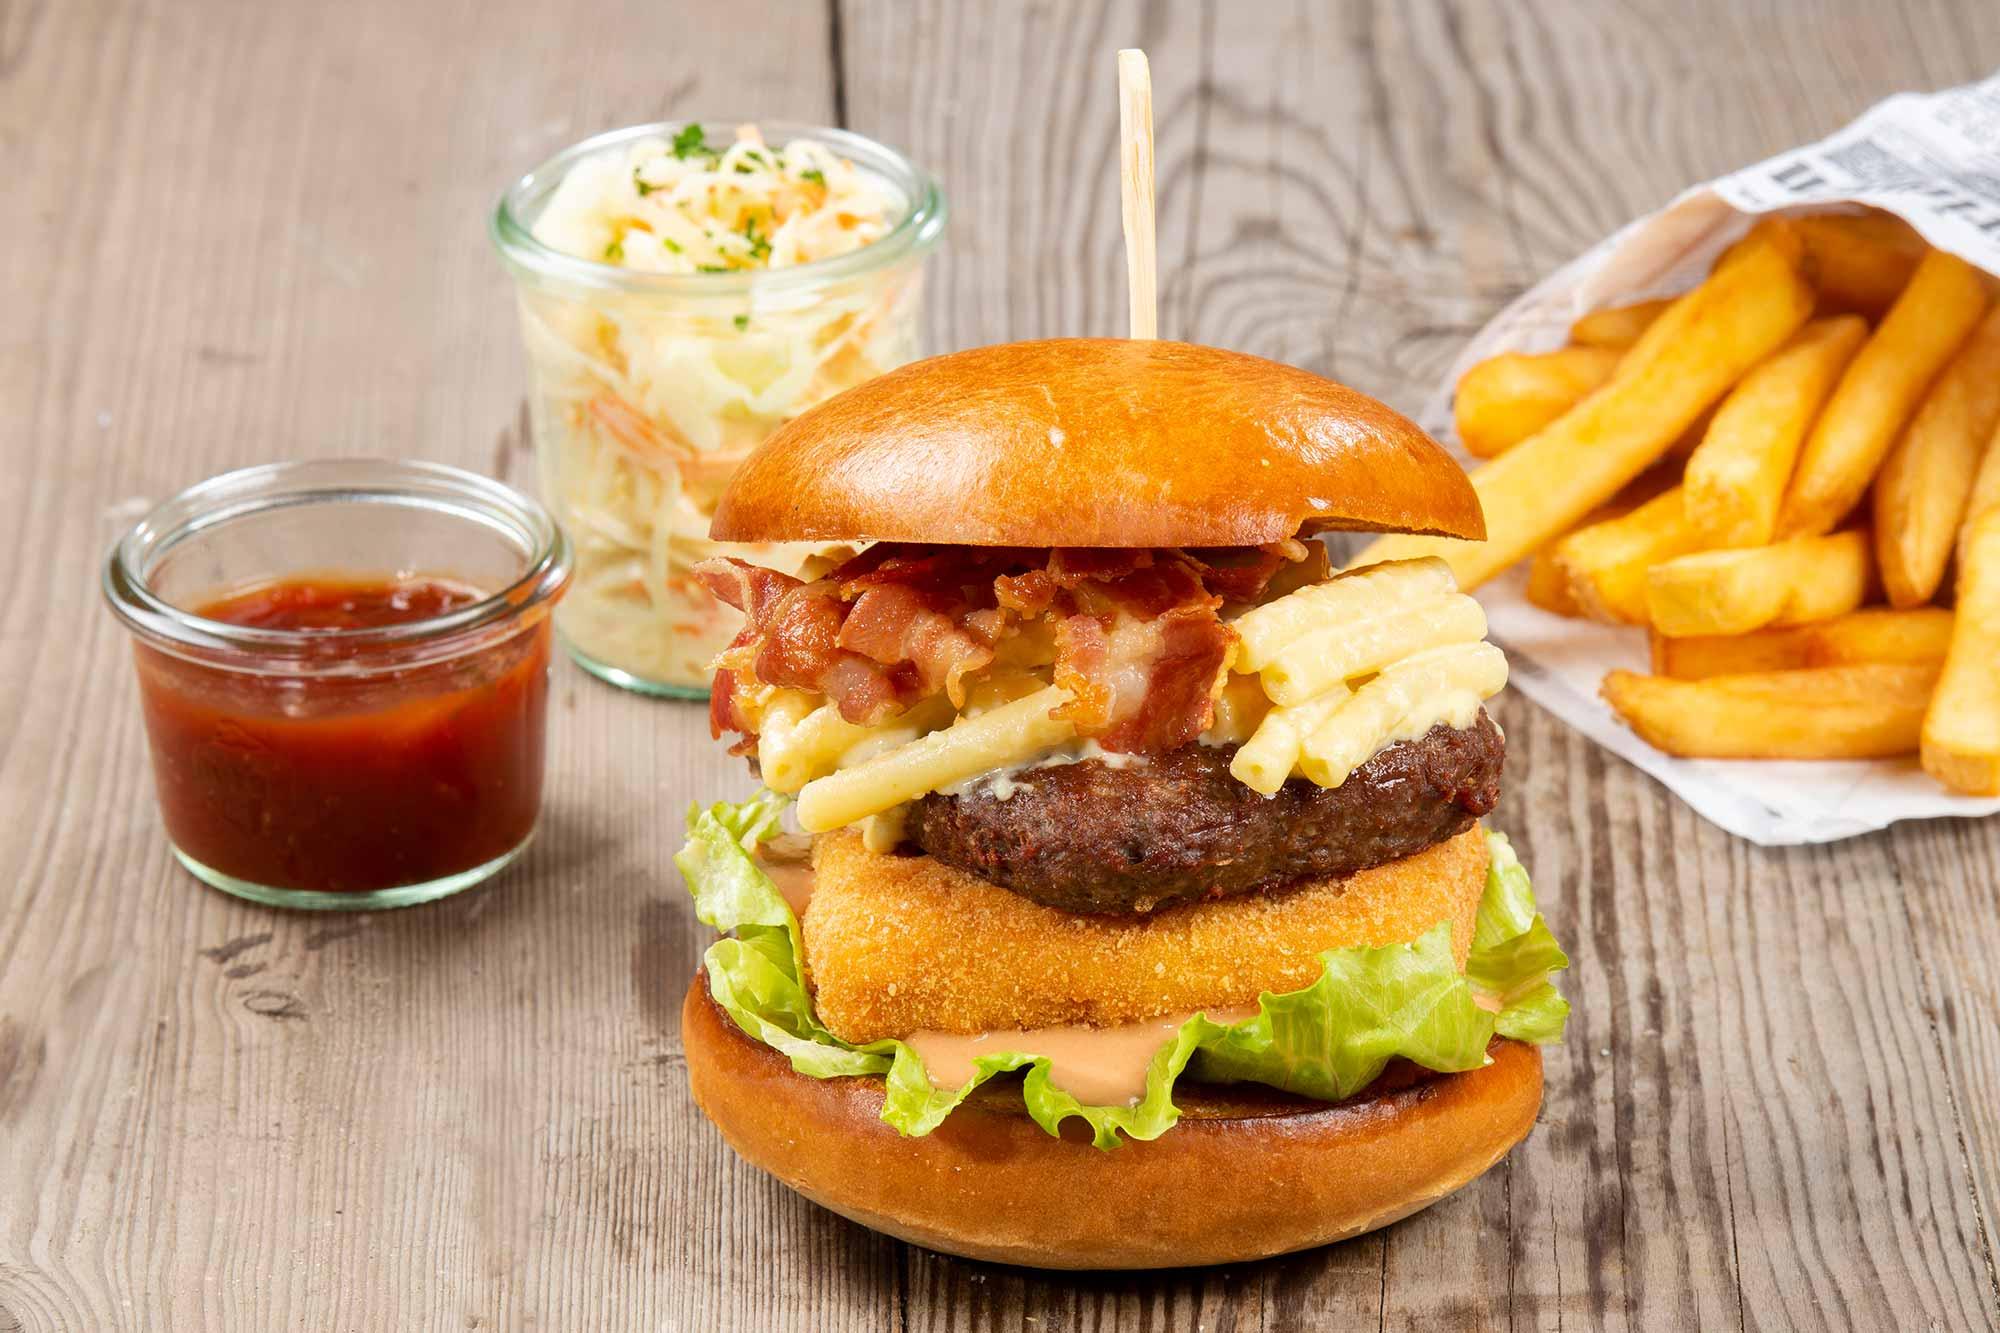 Mac & Cheese Burger - Brioche, 200g Rindfleisch, Bacon, Maccaroni Patty, Käse Maccaroni, Cocktail Sauce, Eisbergsalat